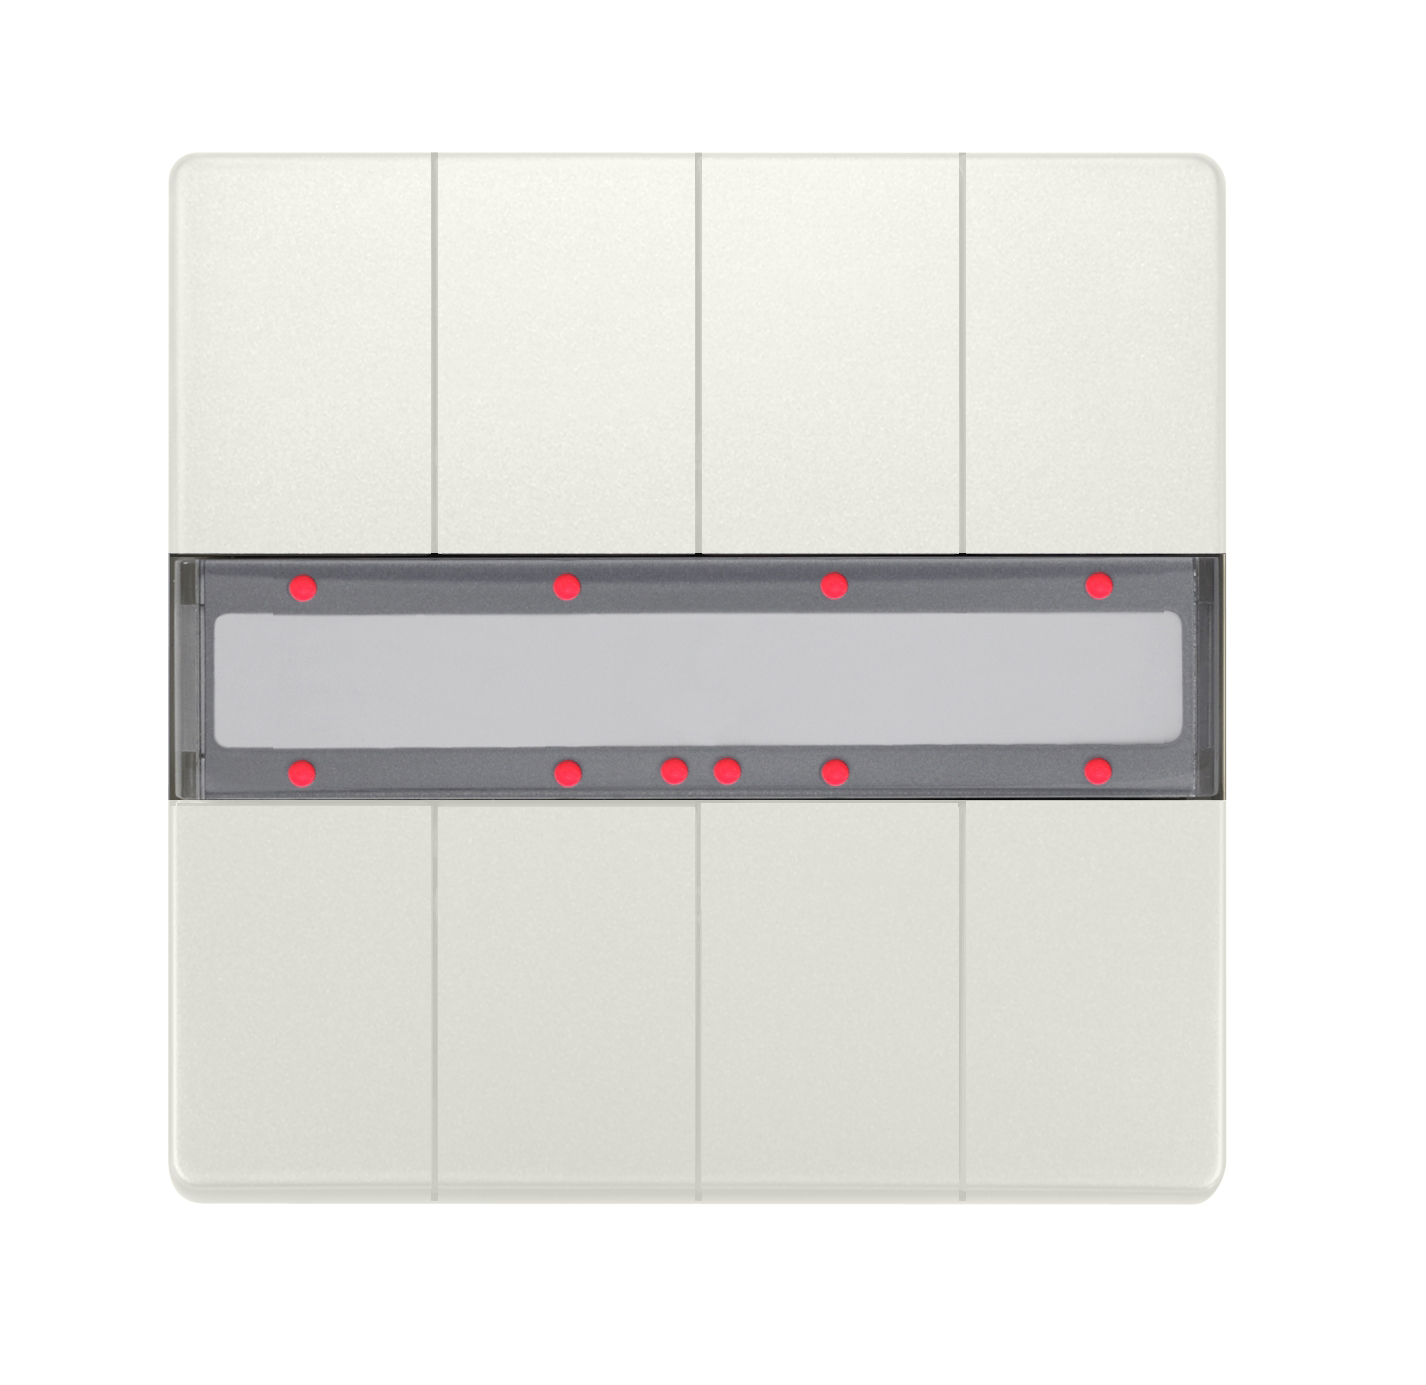 1 Stk Taster, 4-fach mit Status-LED, DELTA style, titanweiß KX2872AB14